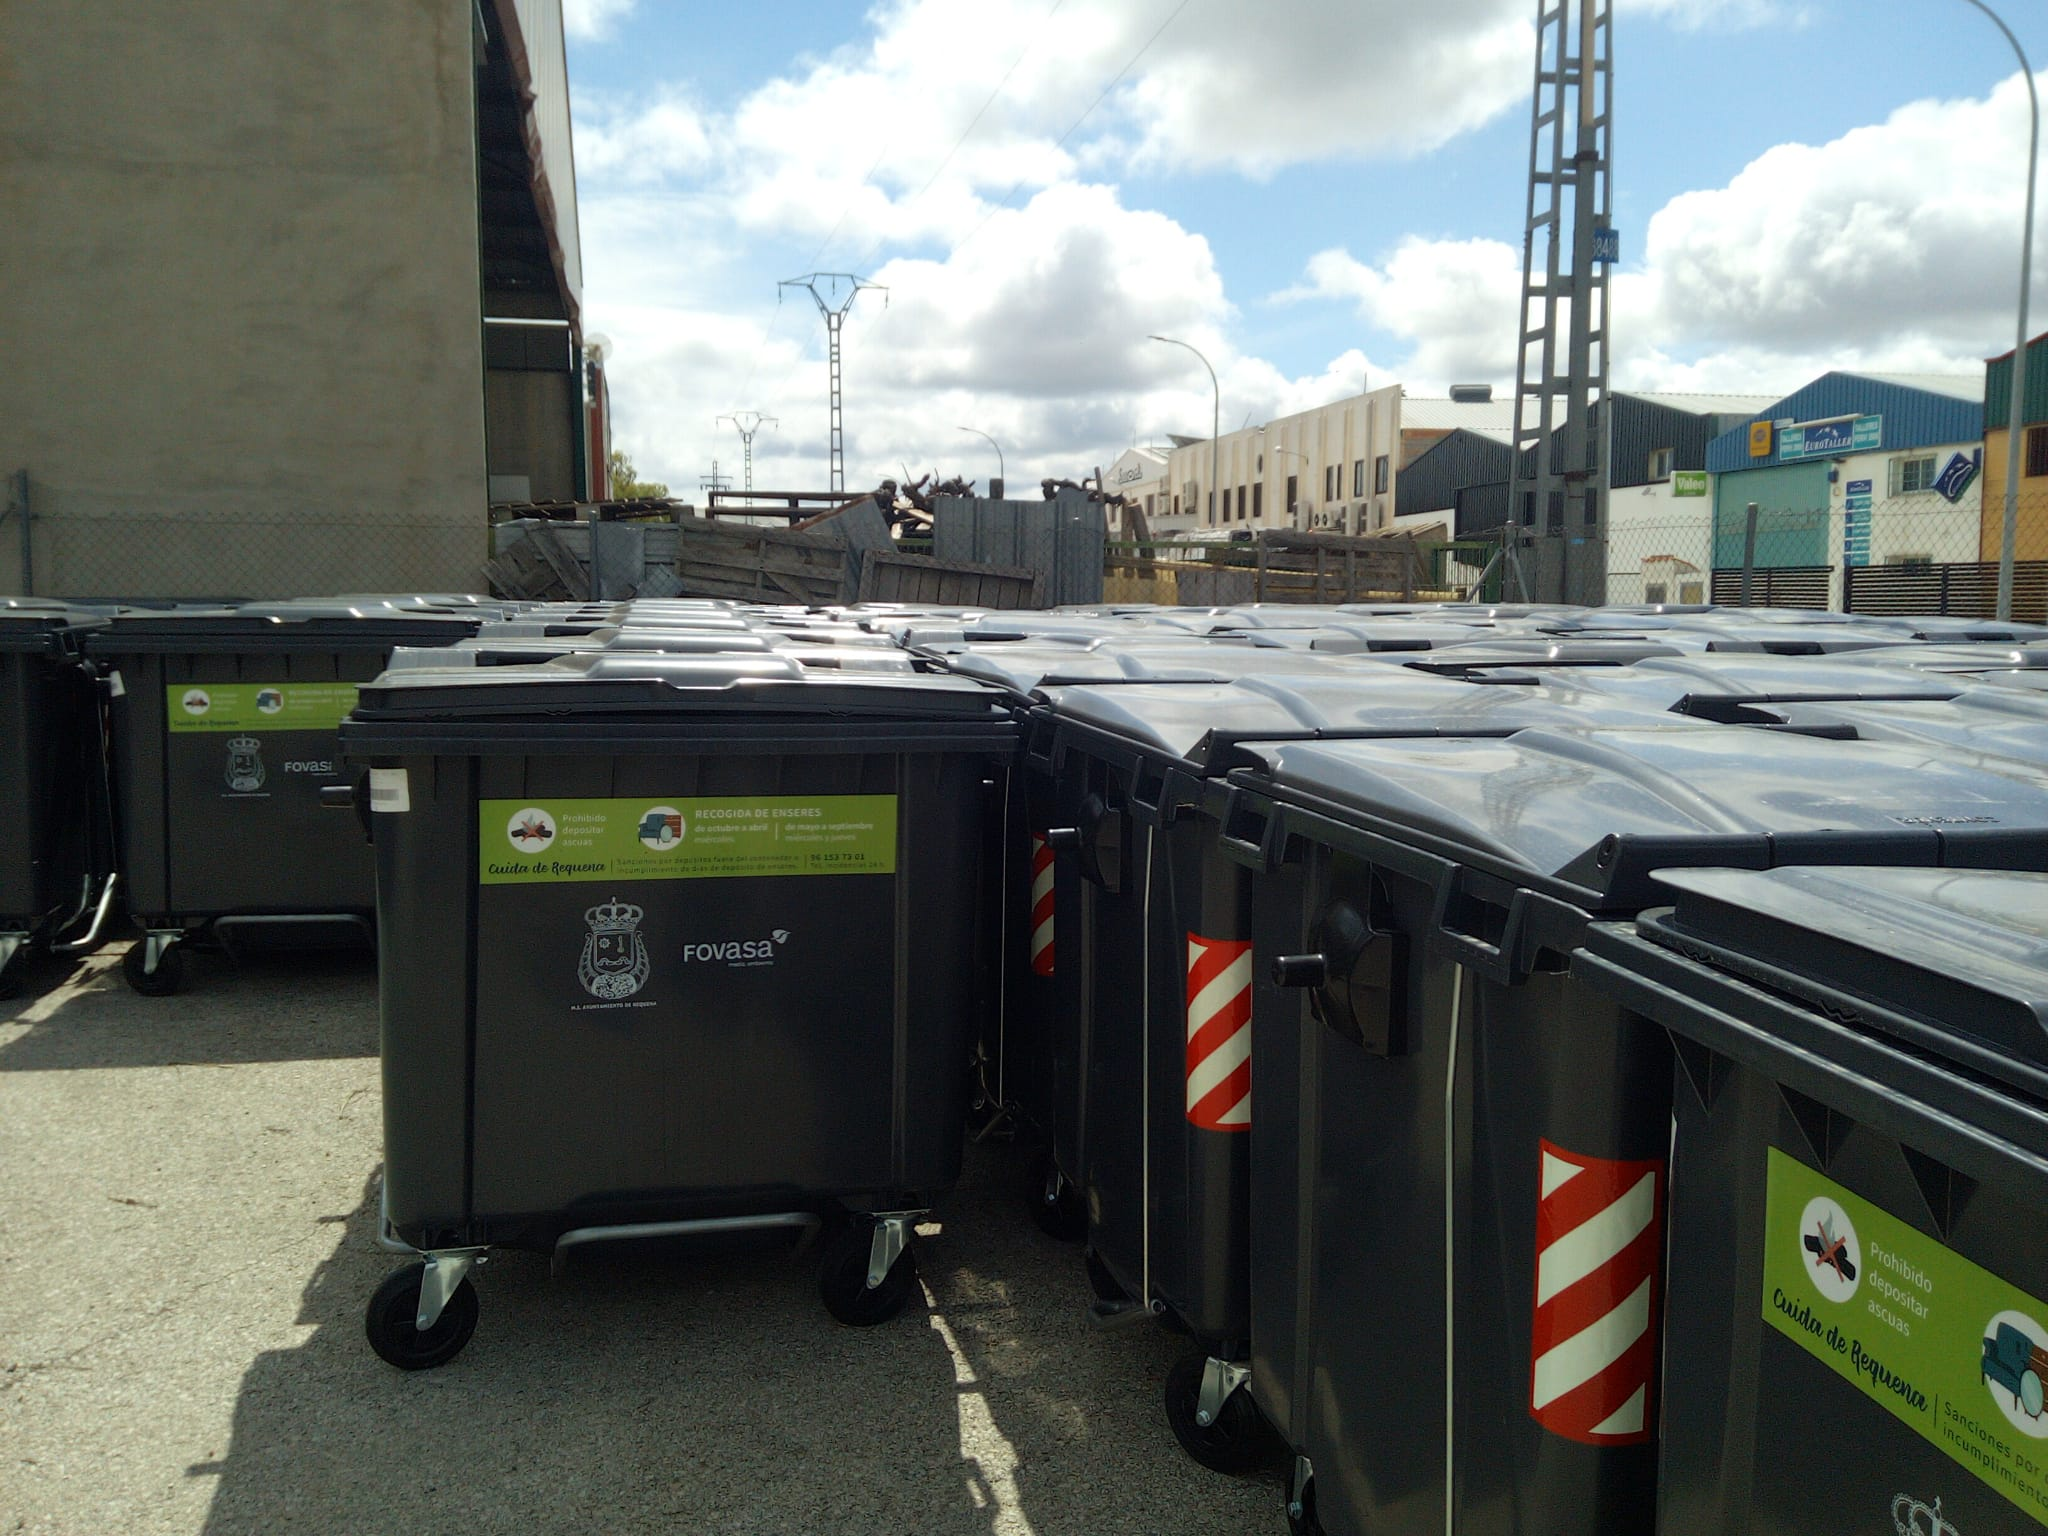 requena-fovasa-contenedores-renovacion